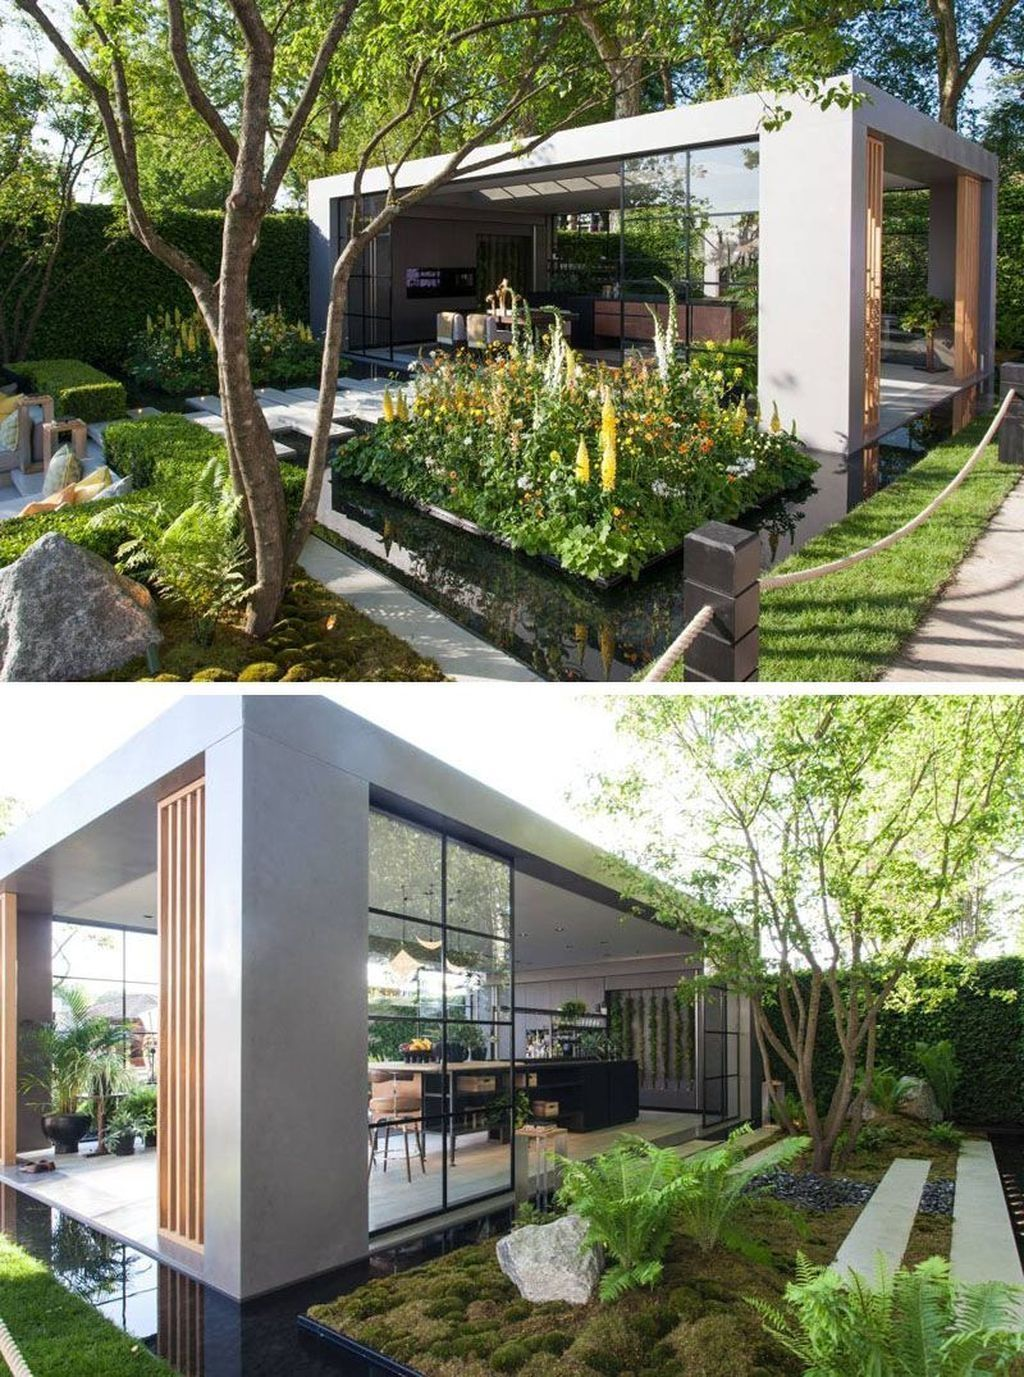 40 Elegant Modern Garden Architecture Design Ideas En 2020 Avec